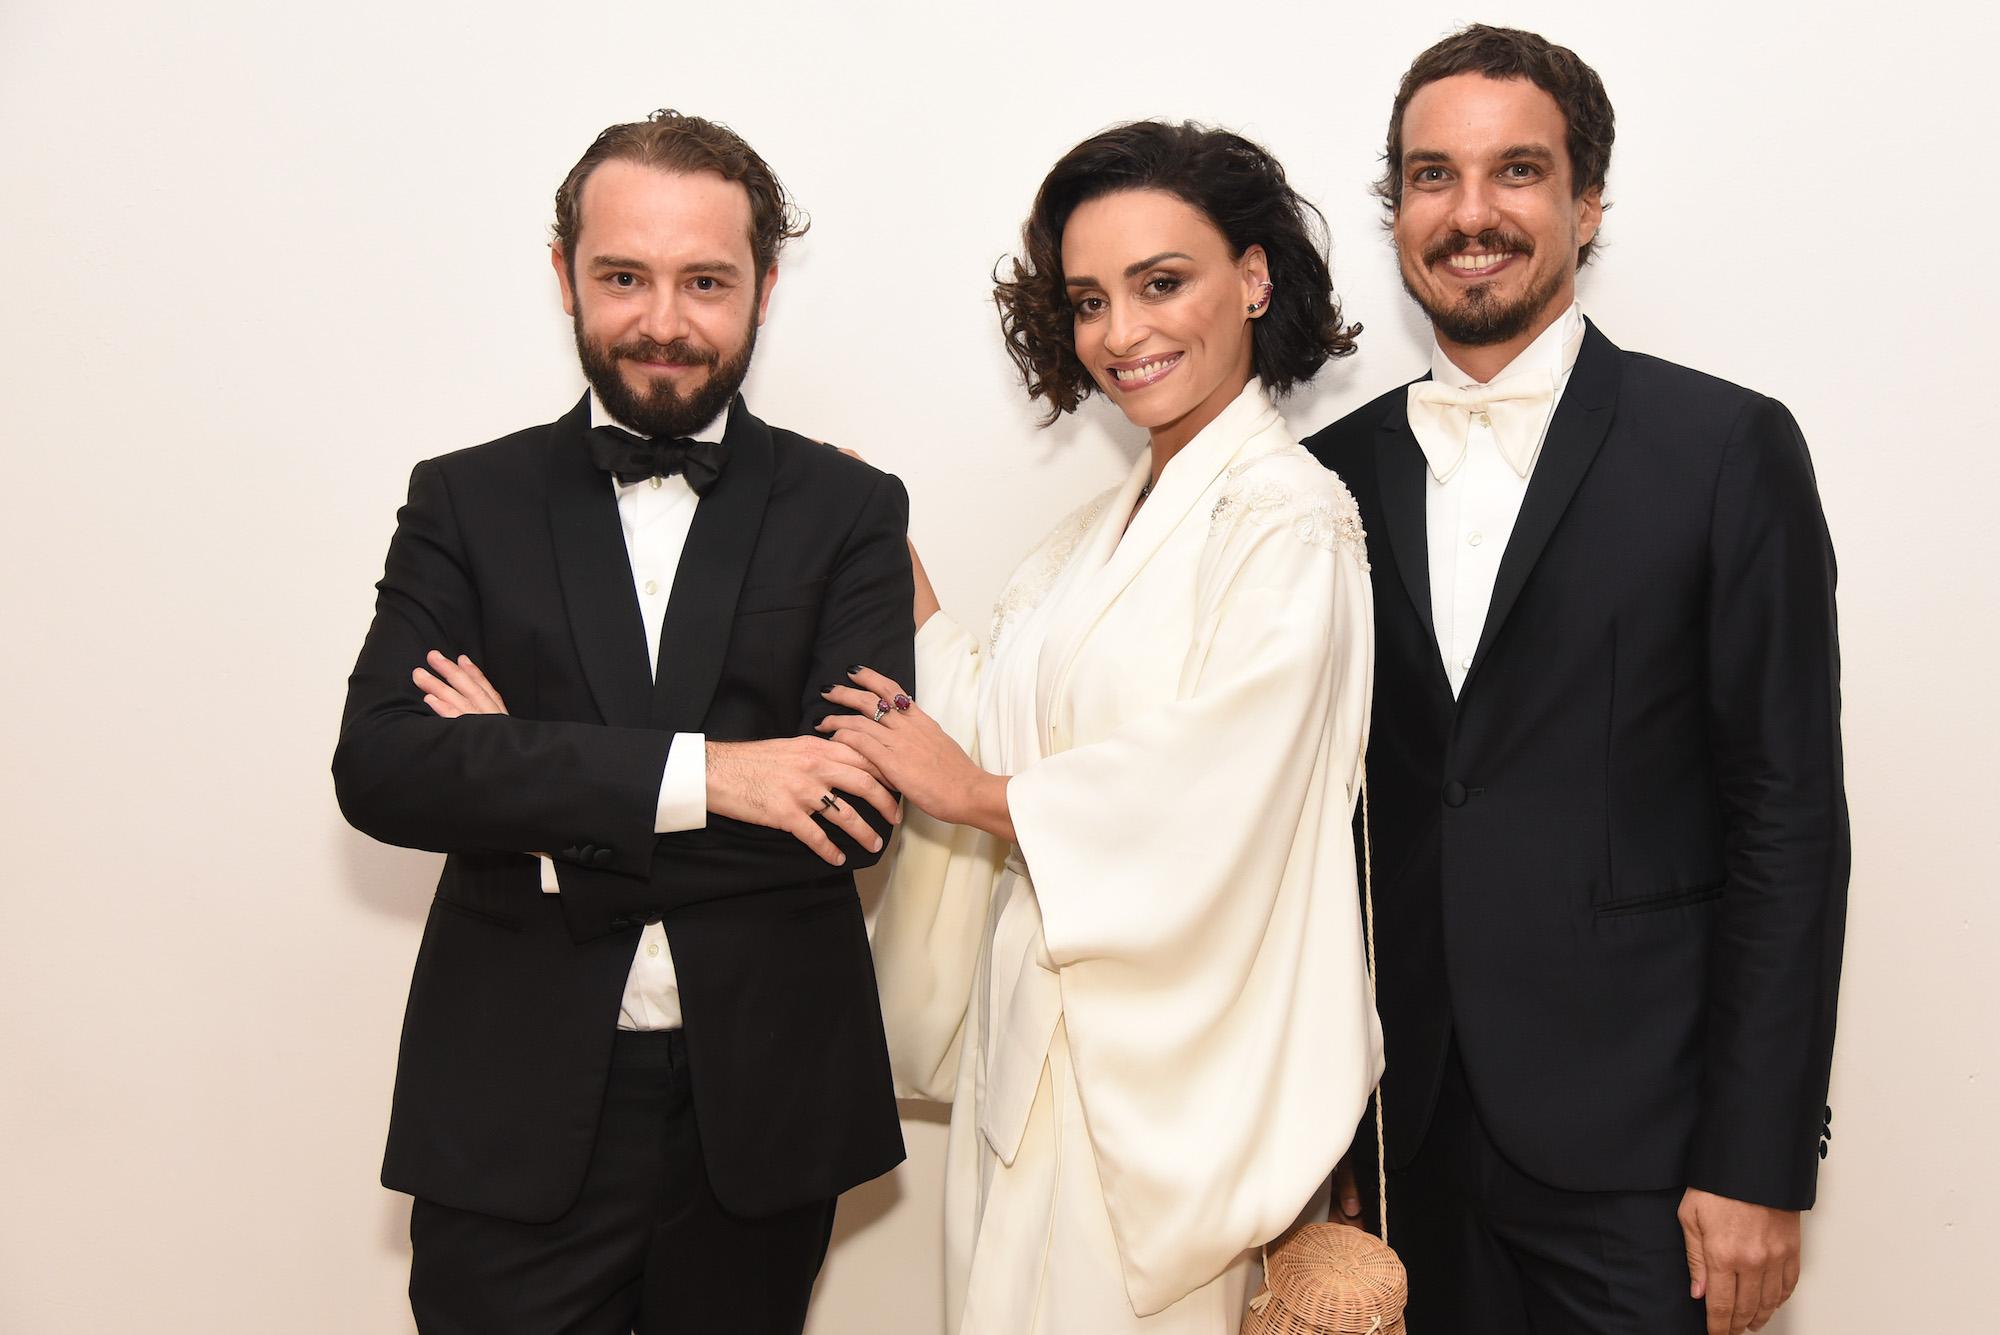 Jeff Ares, Suzana Pires e Thiago Cavalli V BrazilFoundation Gala São Paulo Chanel 2018 Filantropia Brasil Philanthropy Brazil